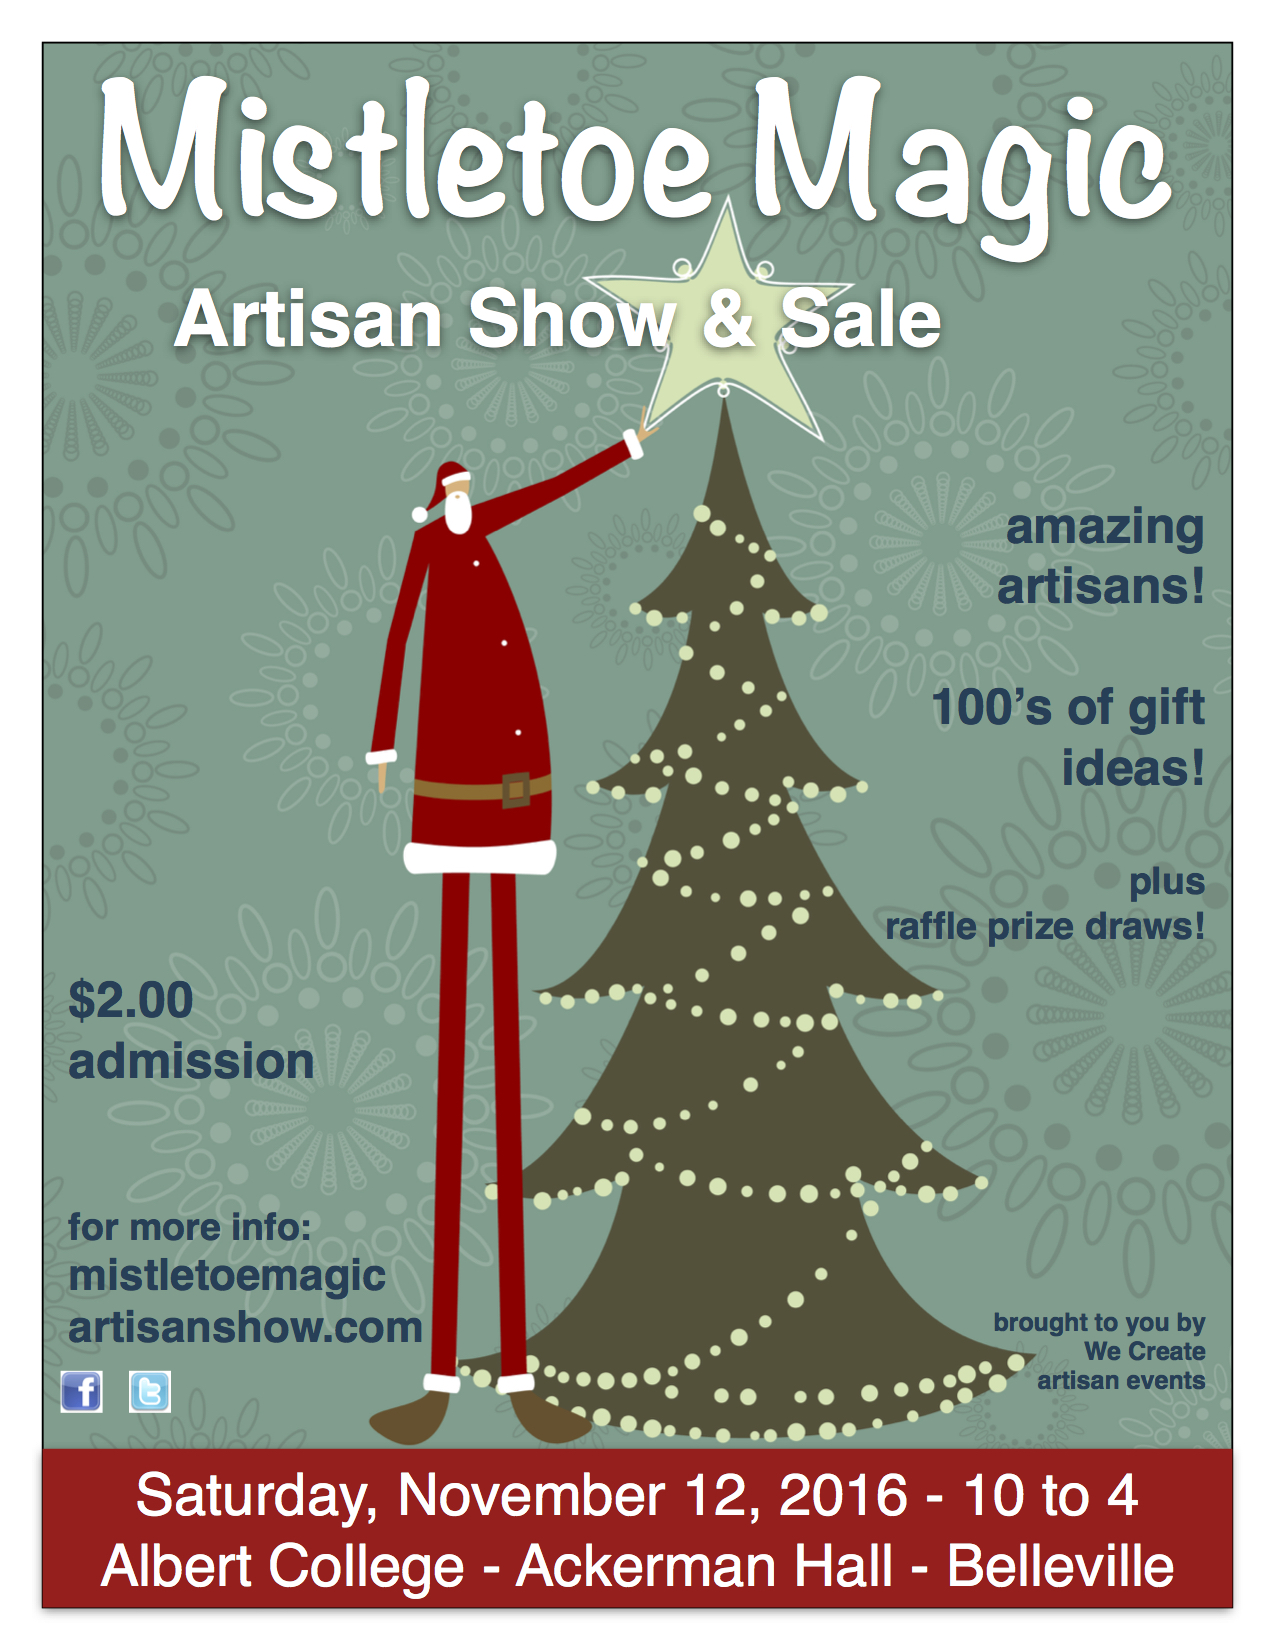 Mistletoe Magic Artisan Show and Sale - Bay of Quinte Tourism